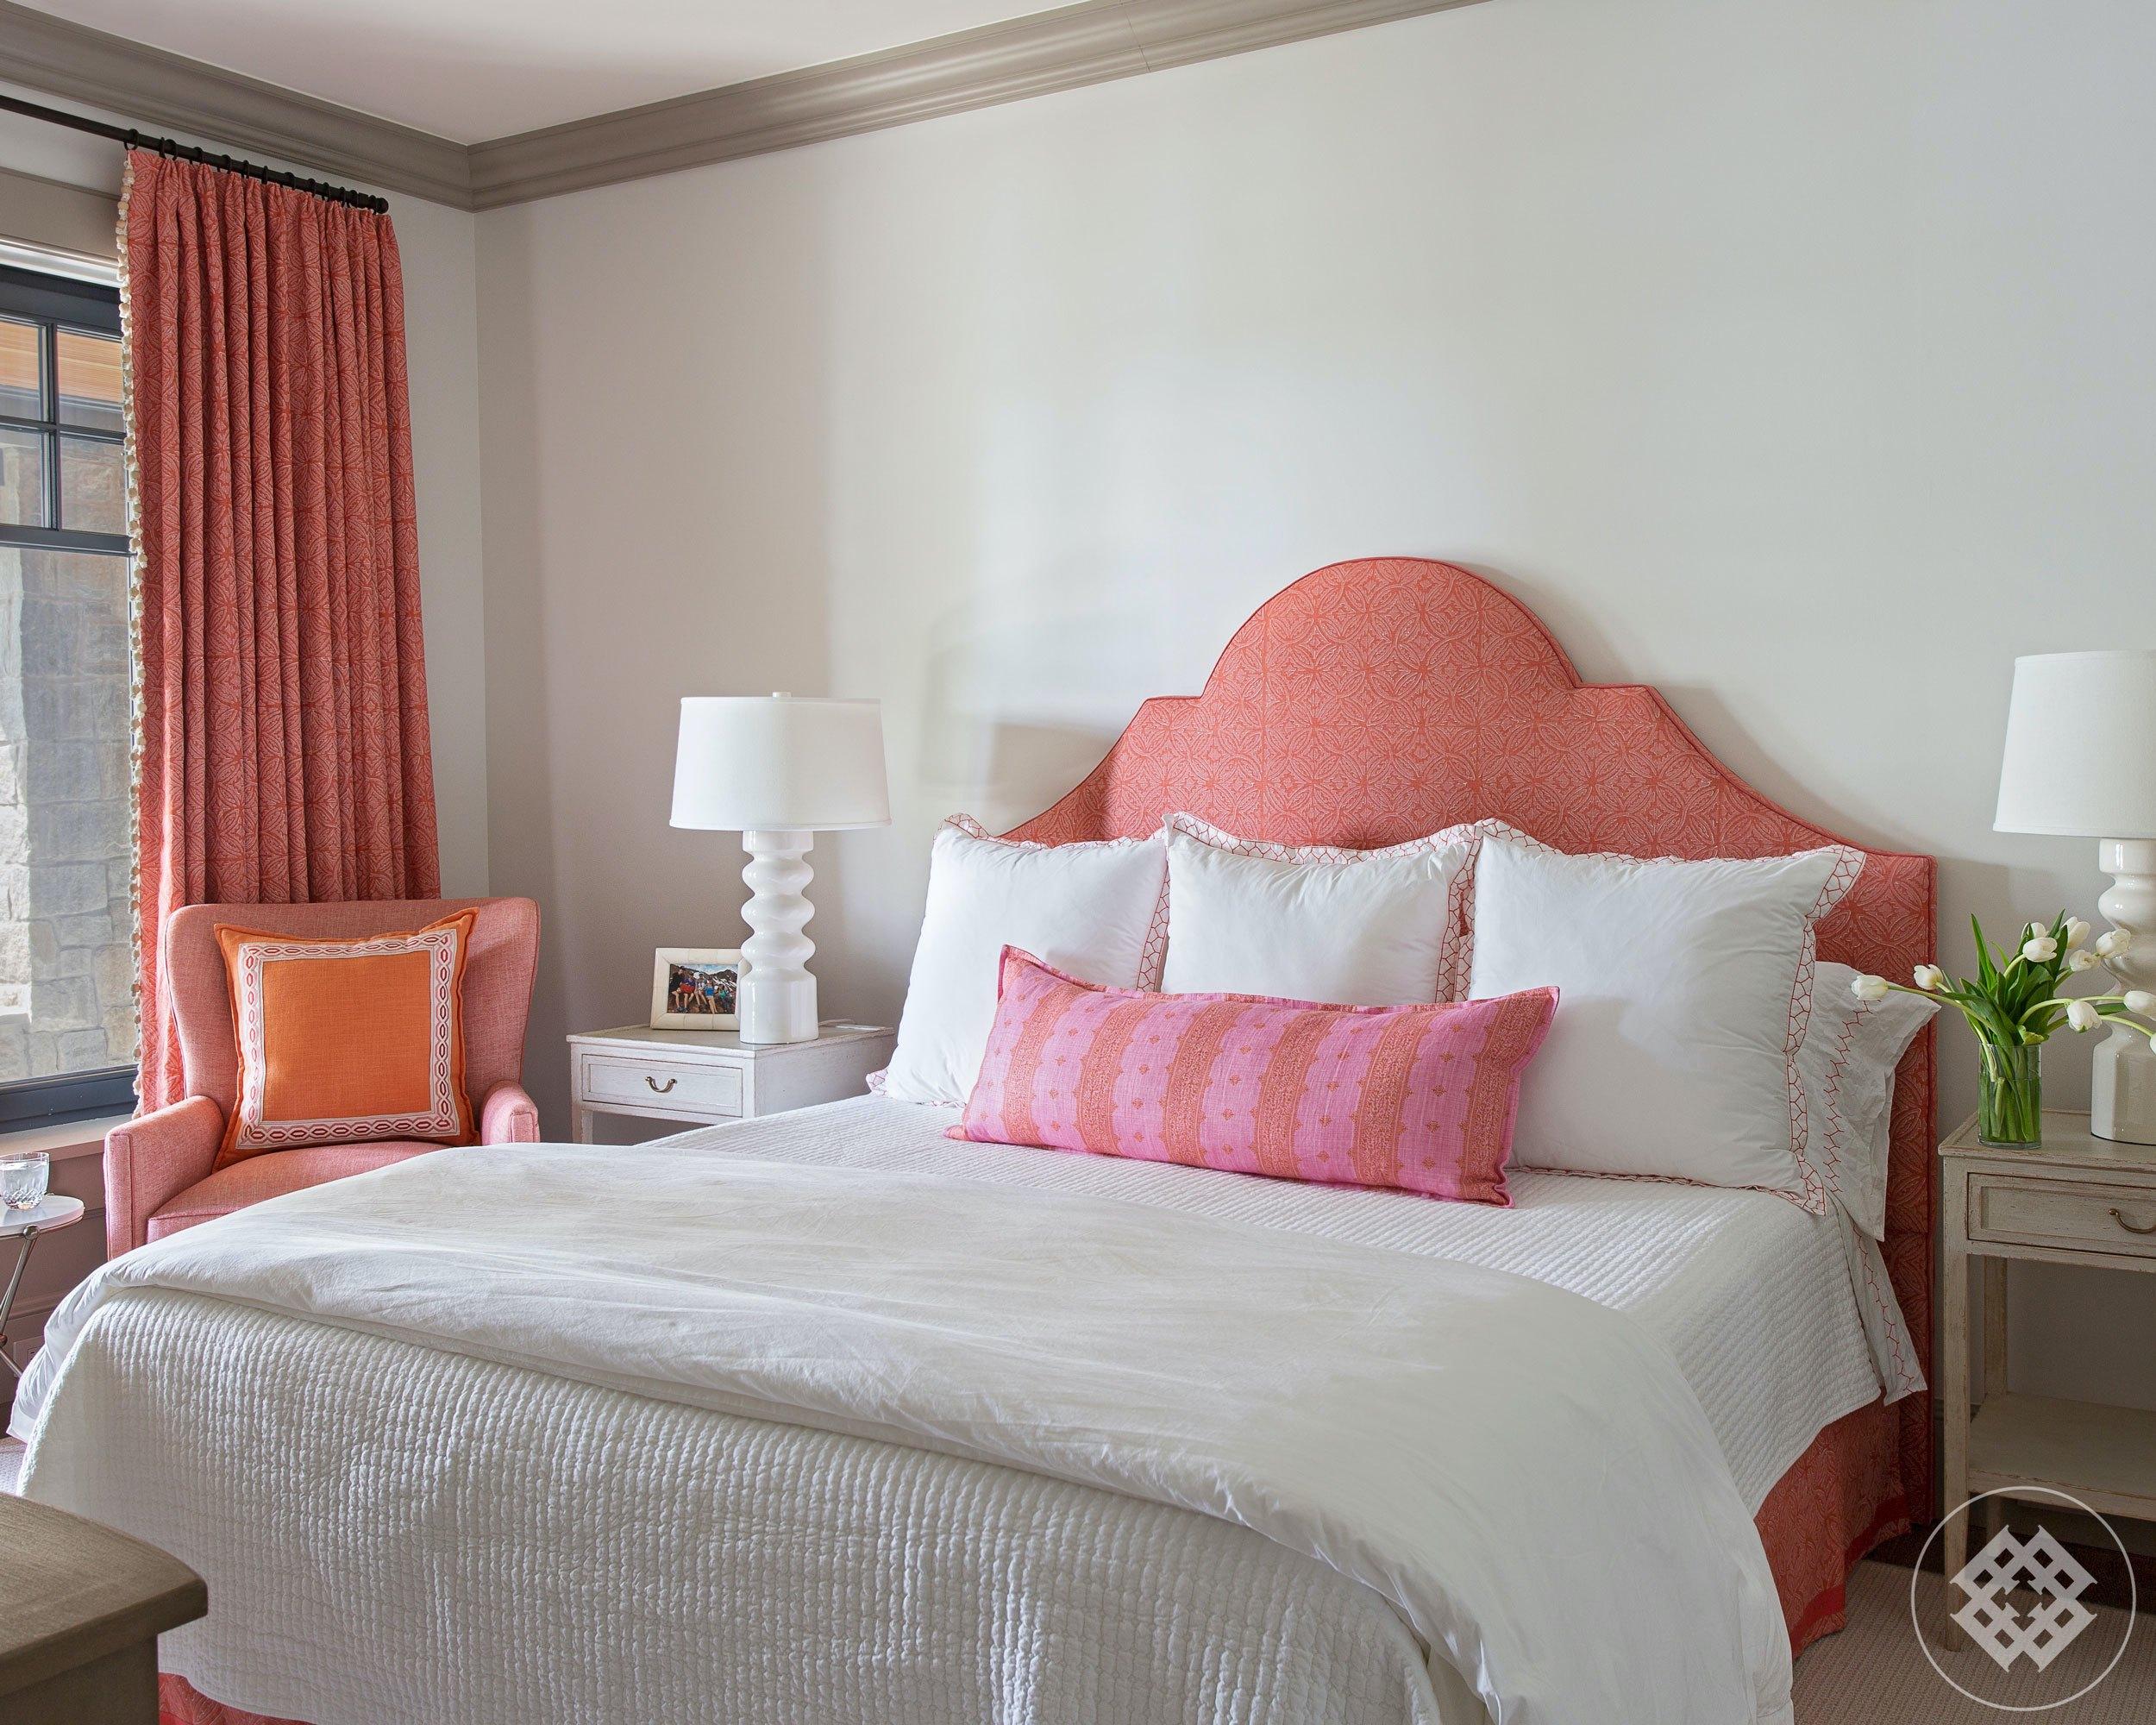 kkl-guest-bedroom-with-custom-upholstered-headboard.jpg